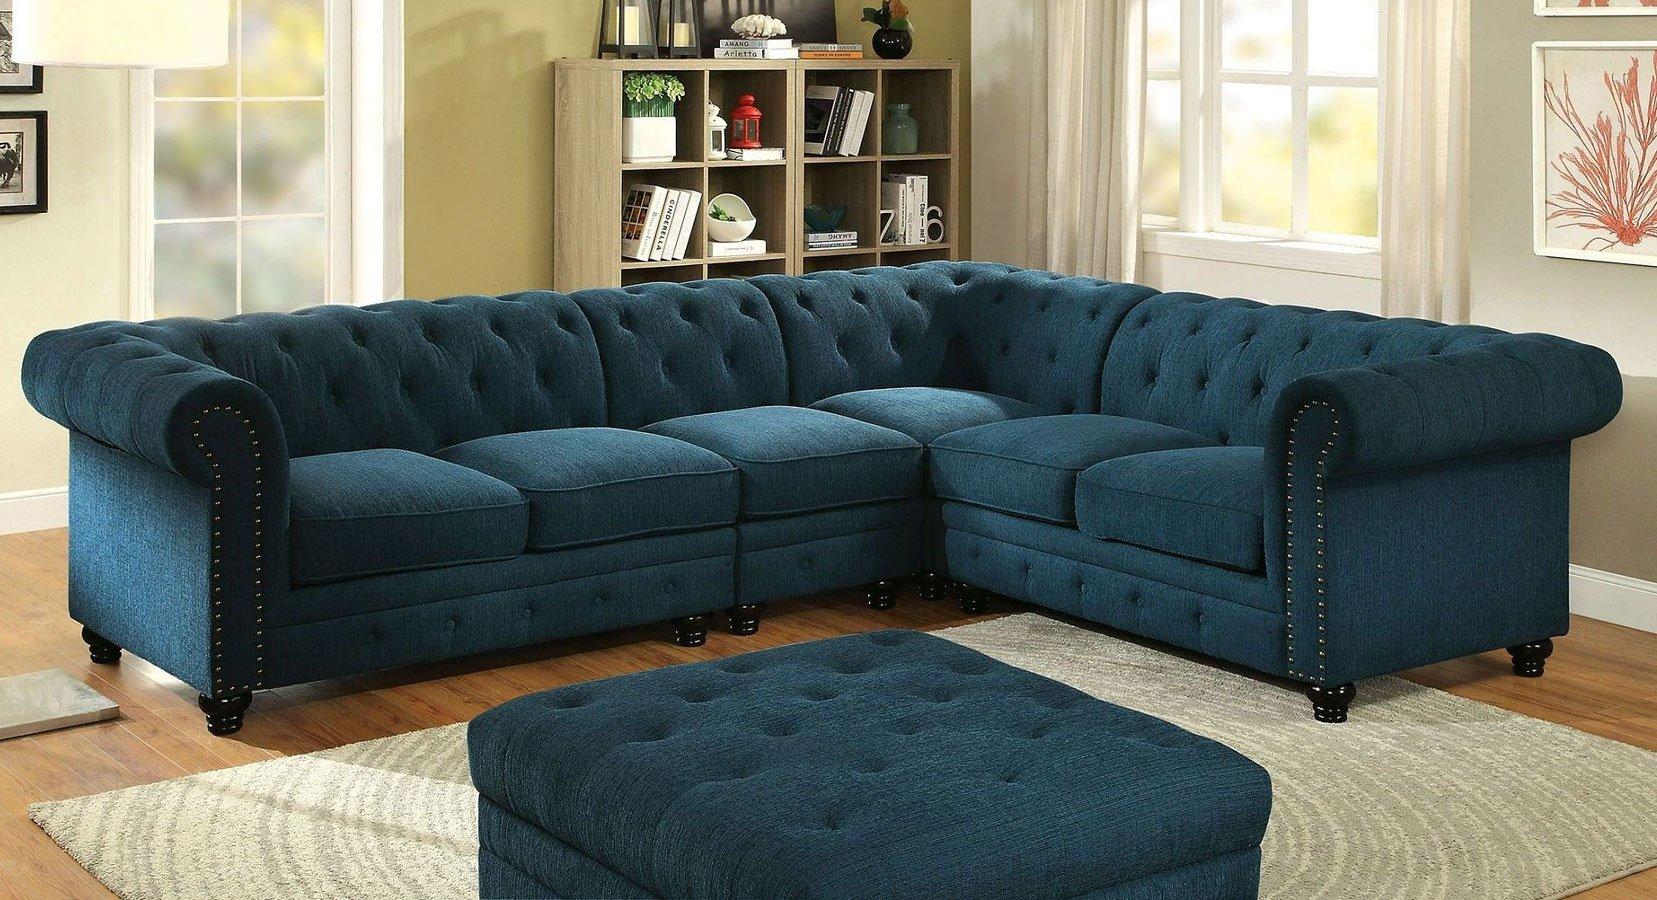 Stanford Sectional Living Room Set (Teal)